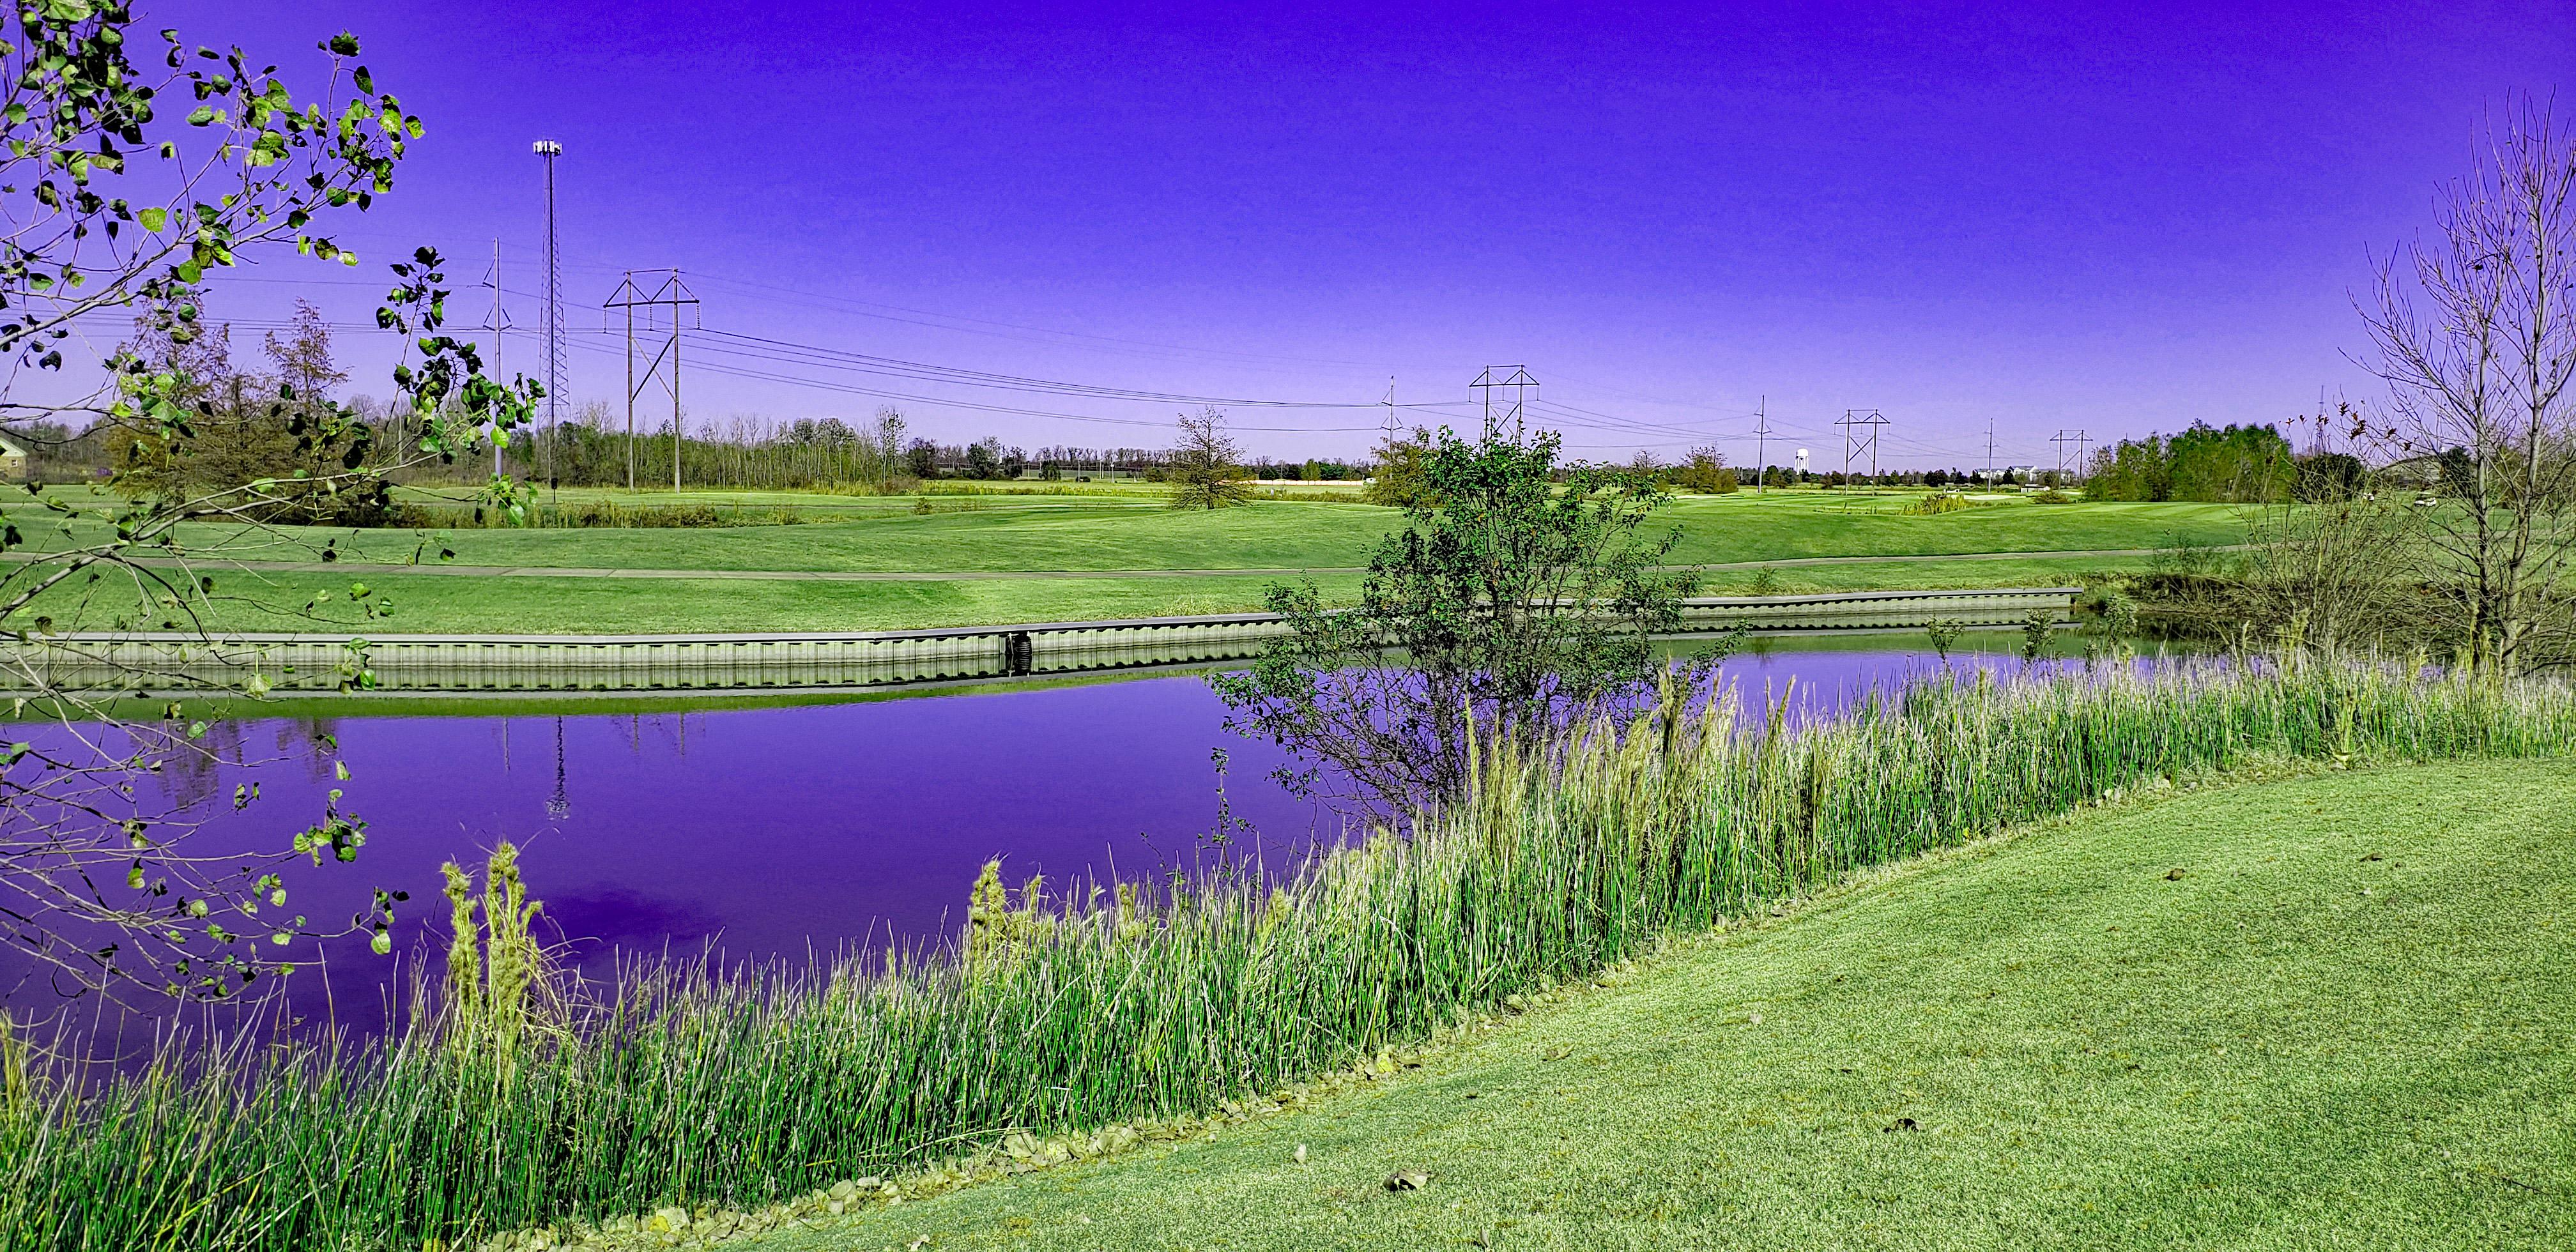 TunicaNational_MississippiGolf_The GolfinGuy_18